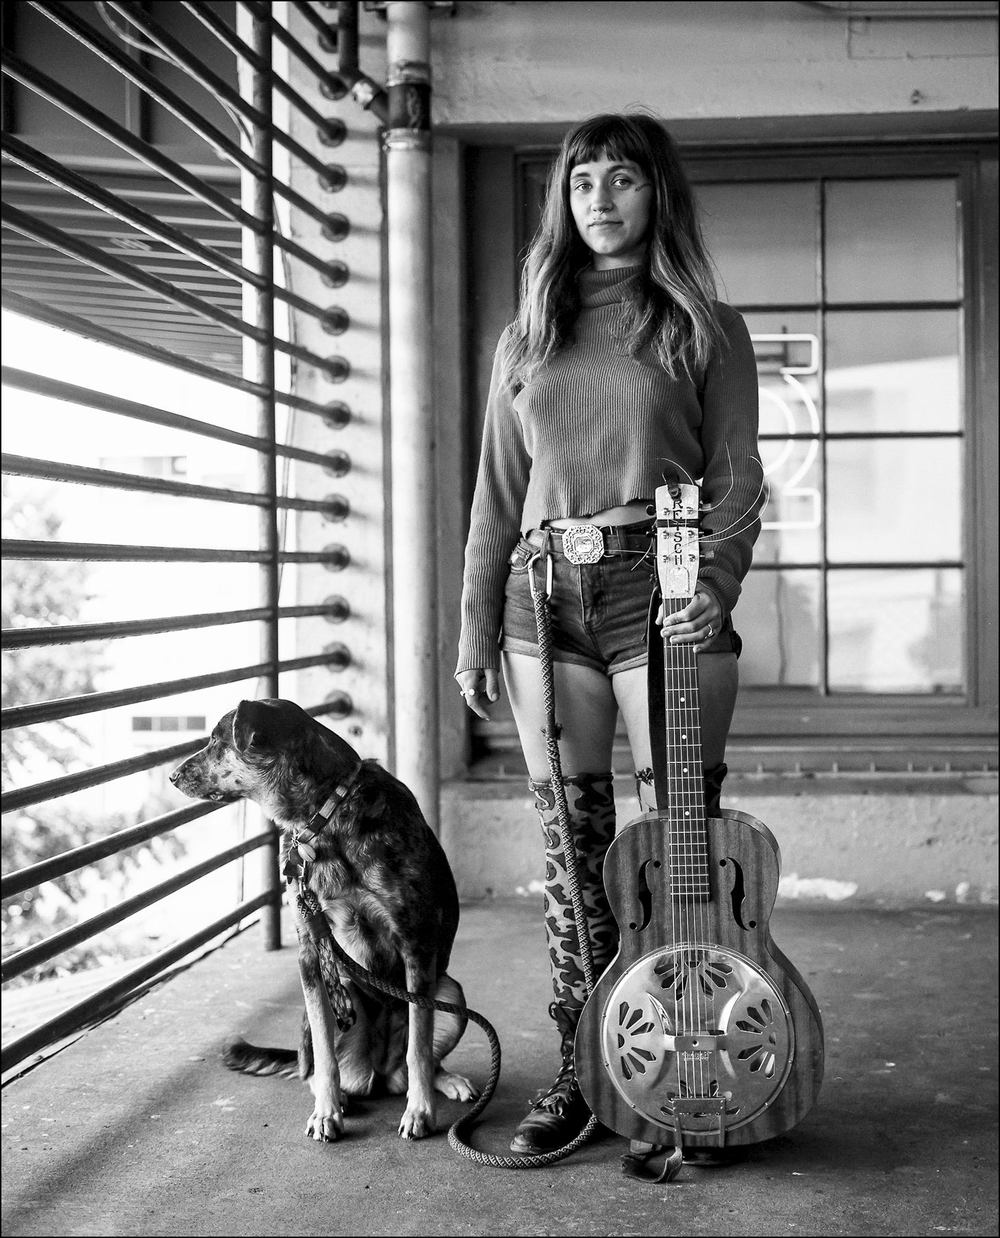 Sierra Ferrell Street Musician | Mamiya 6 75mm | Robert Munoz